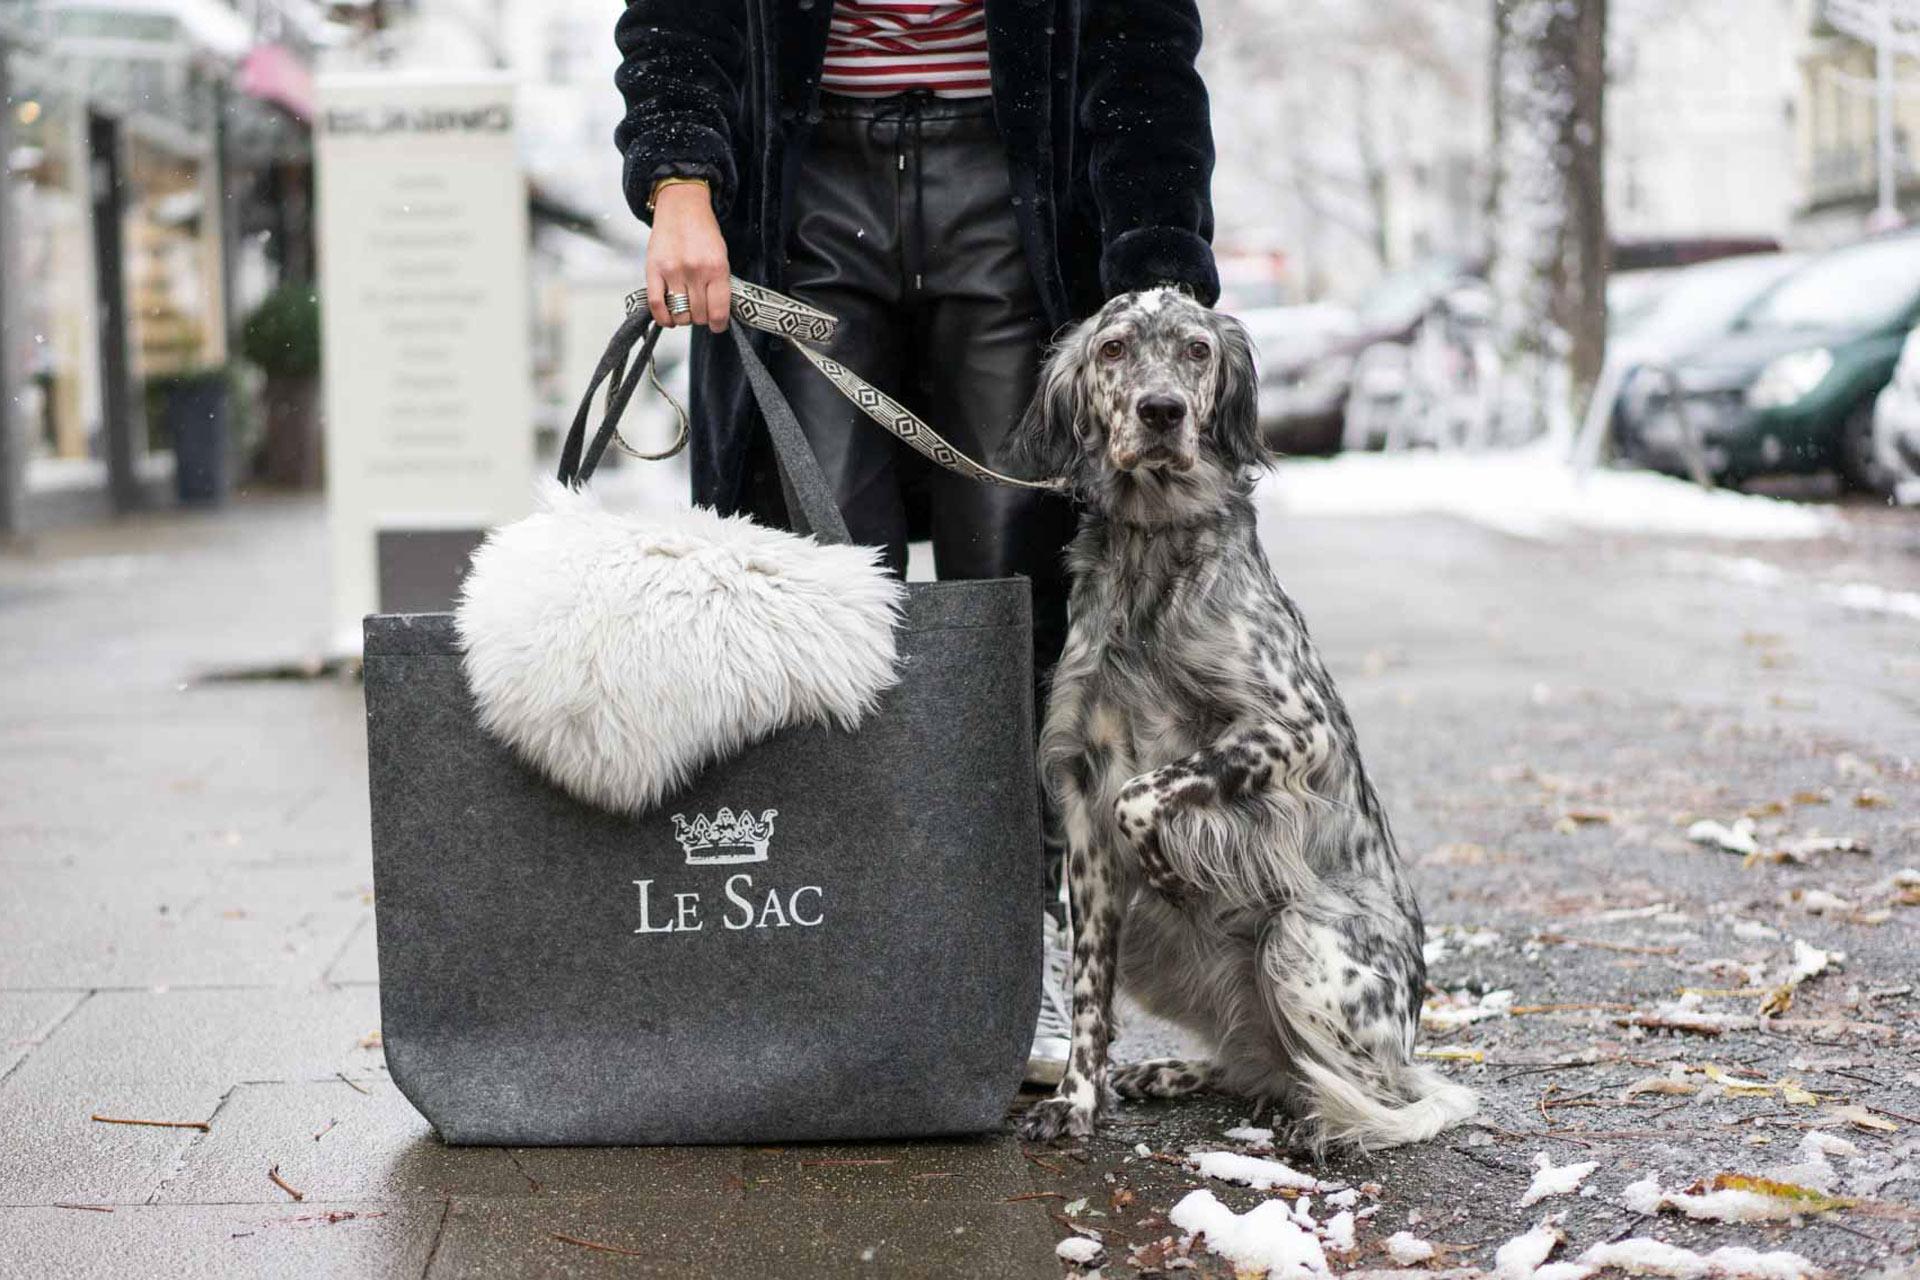 luxussachen-lesac-emma583d448fbb760